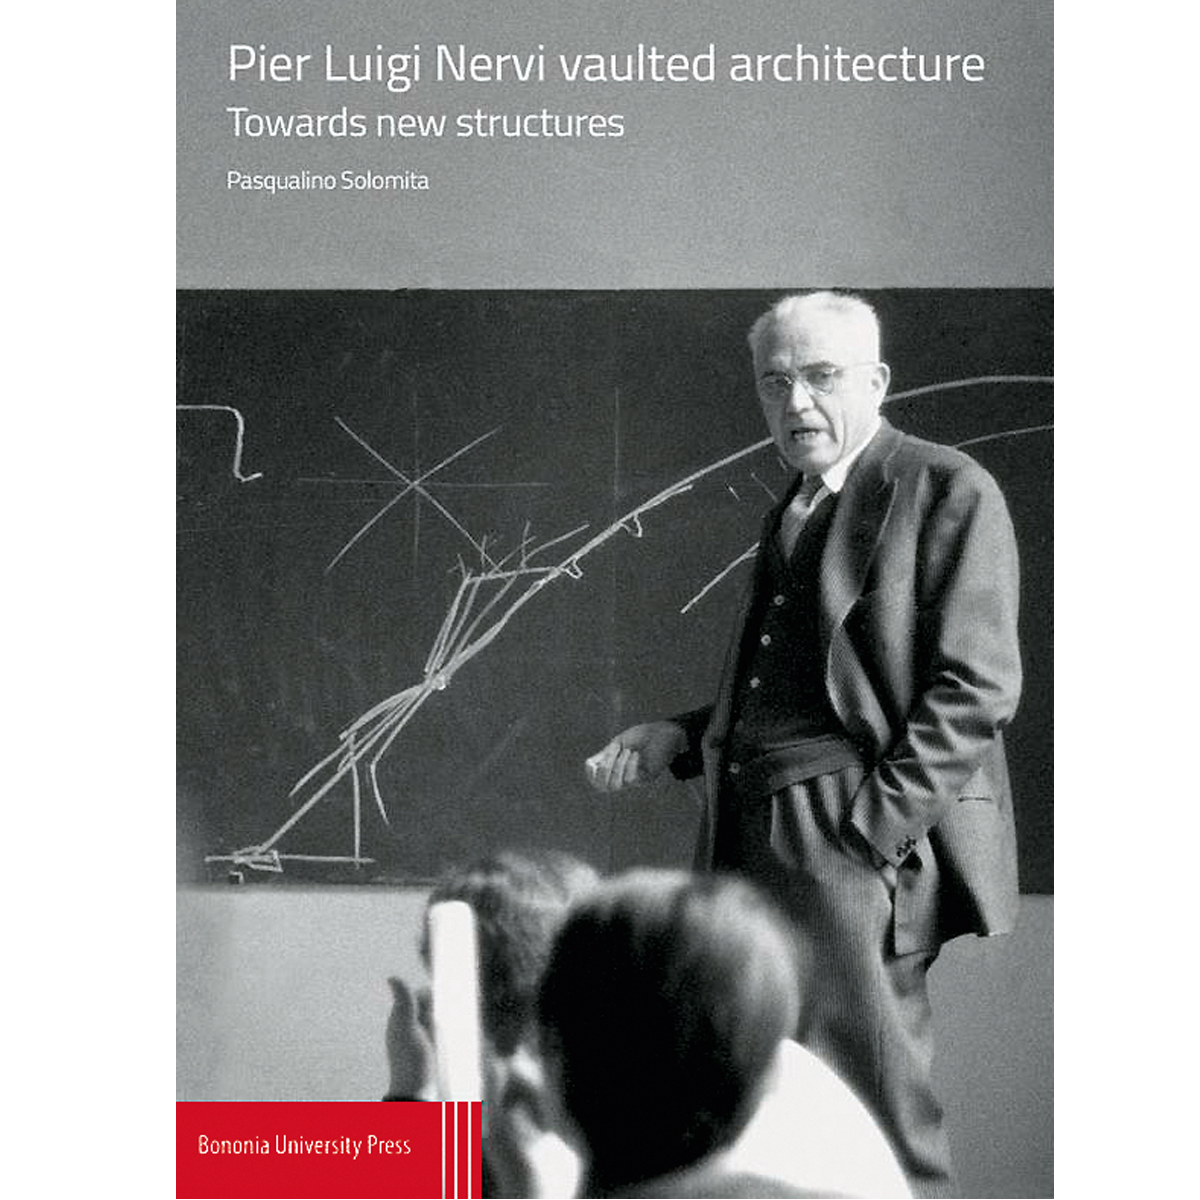 Pier Luigi Nervi Vaulted Architecture